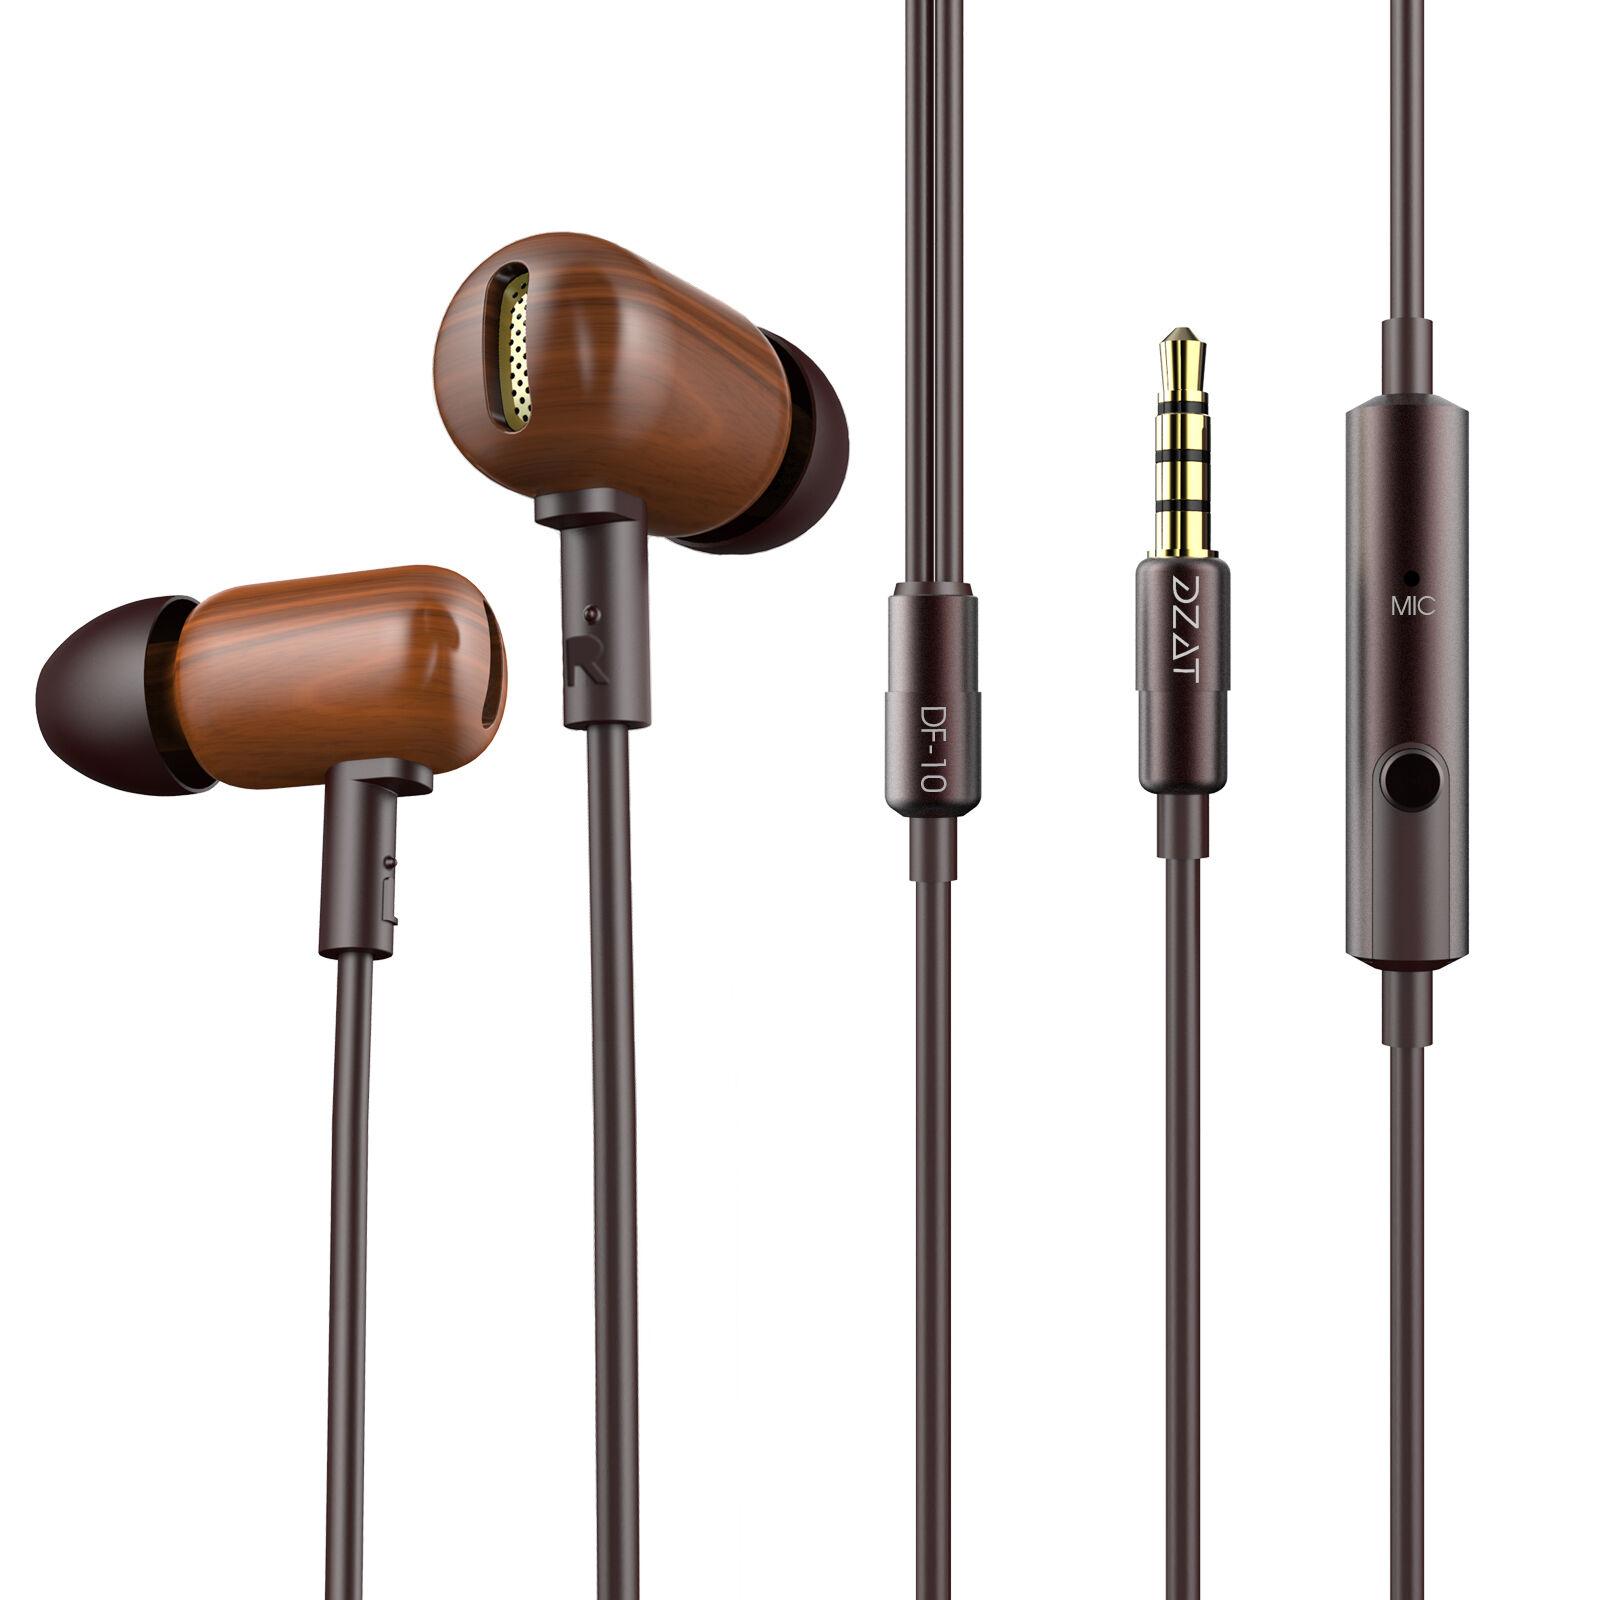 DZAT DF10 Wooden Stereo Earbuds Fullrange Balance In Ear Earphones with Mic